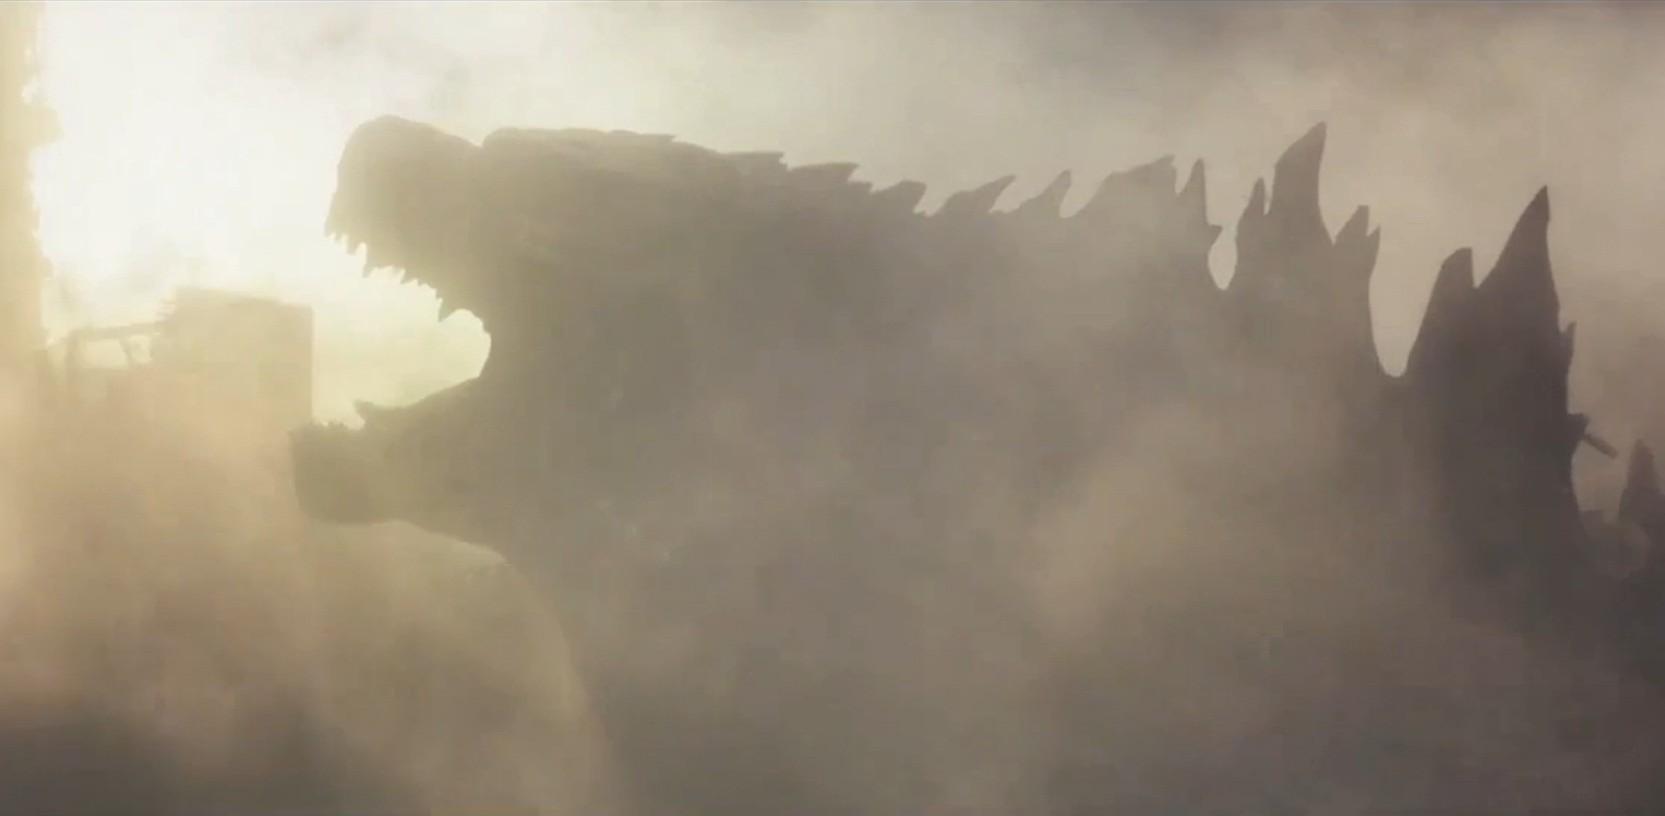 Mmmm, car snacks. Seven things Godzilla likes to eat